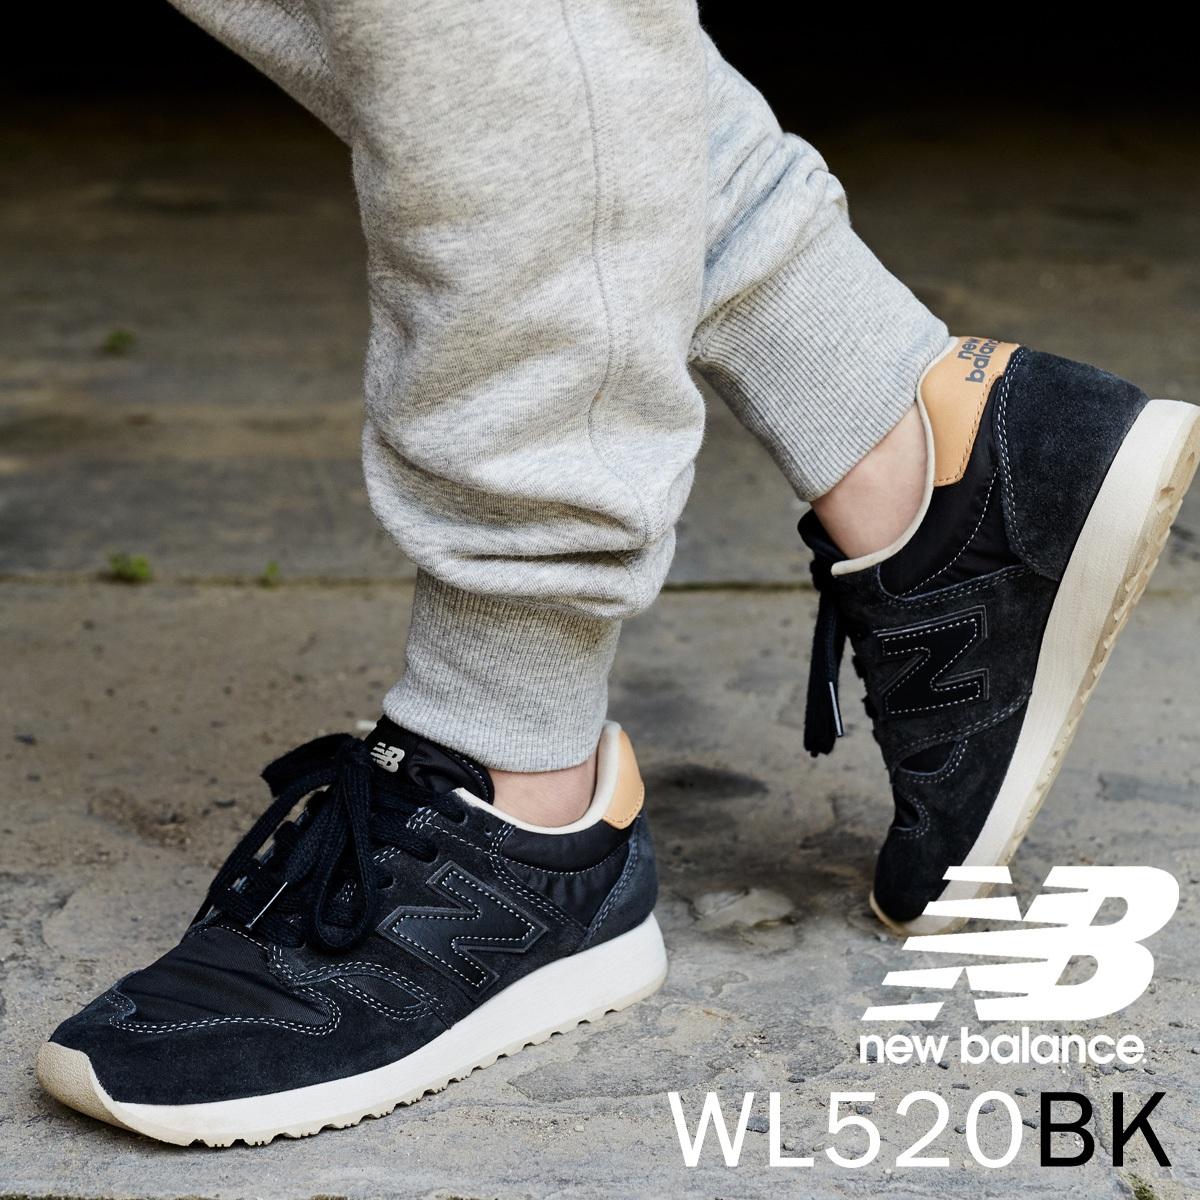 new balance wl520bk